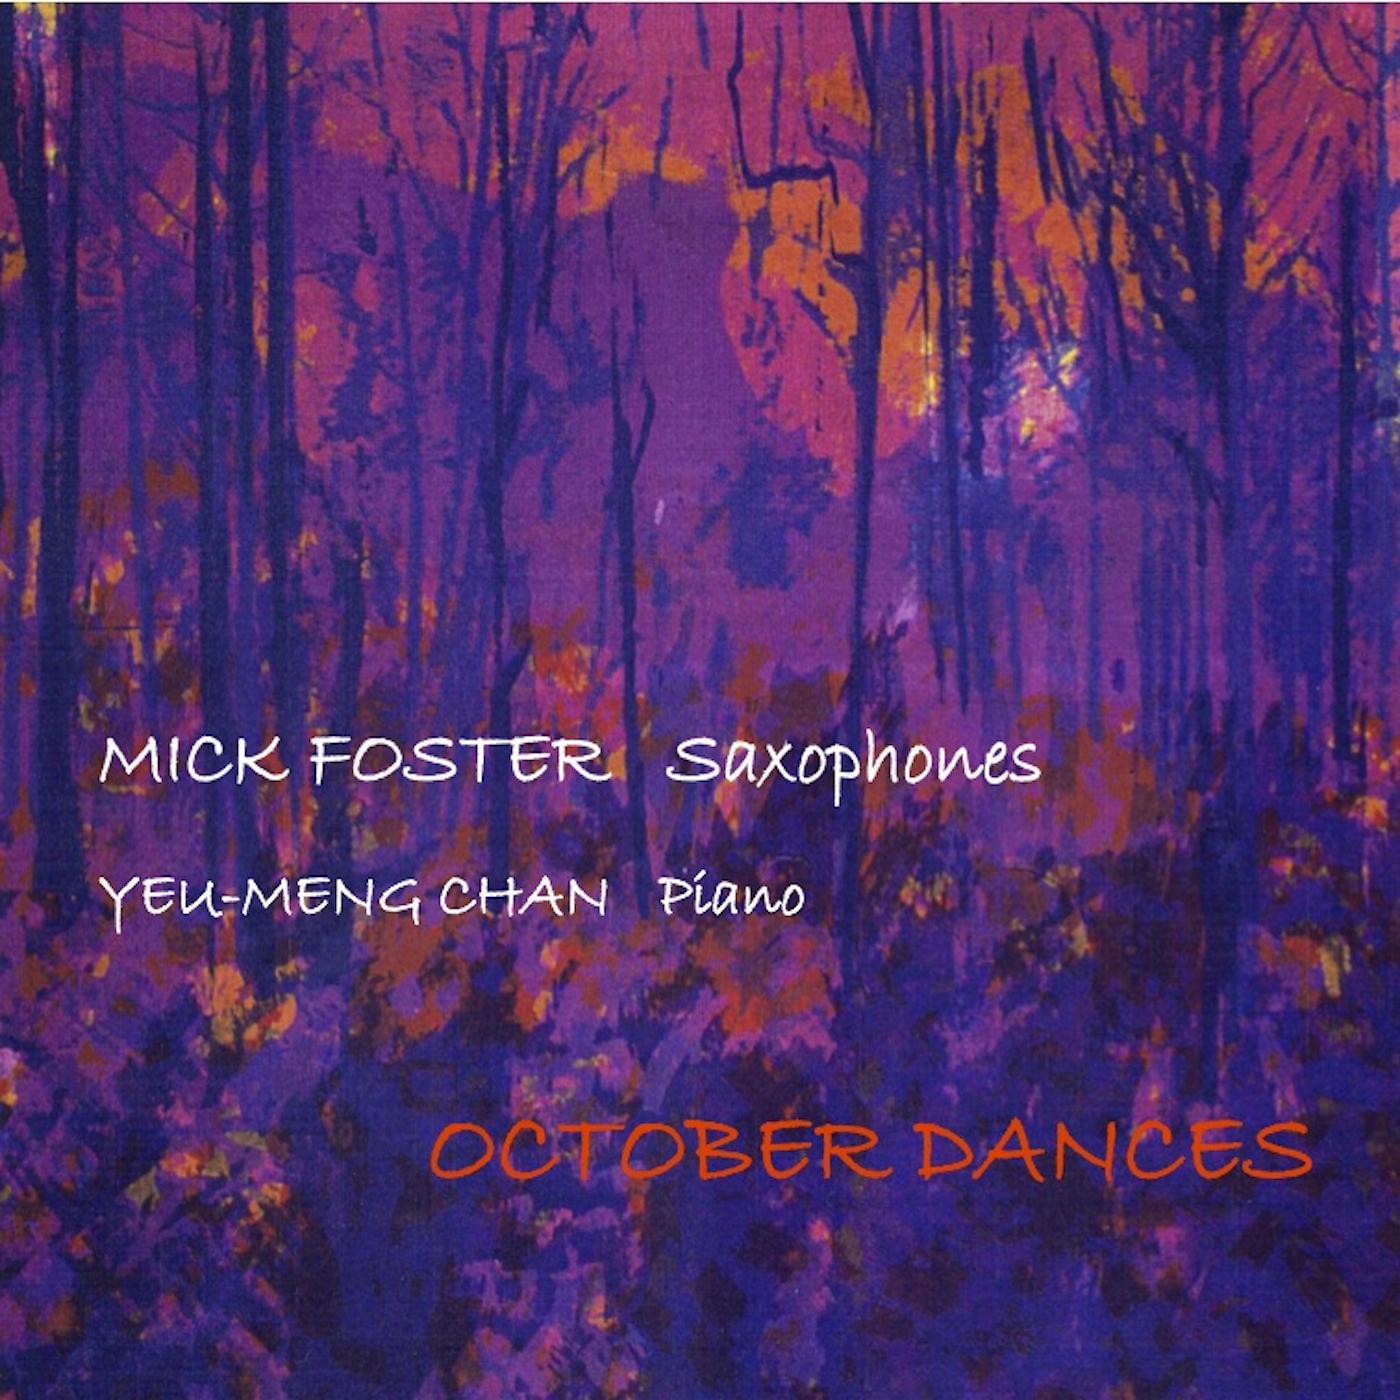 October Dances AWAL front cover copy.jpg